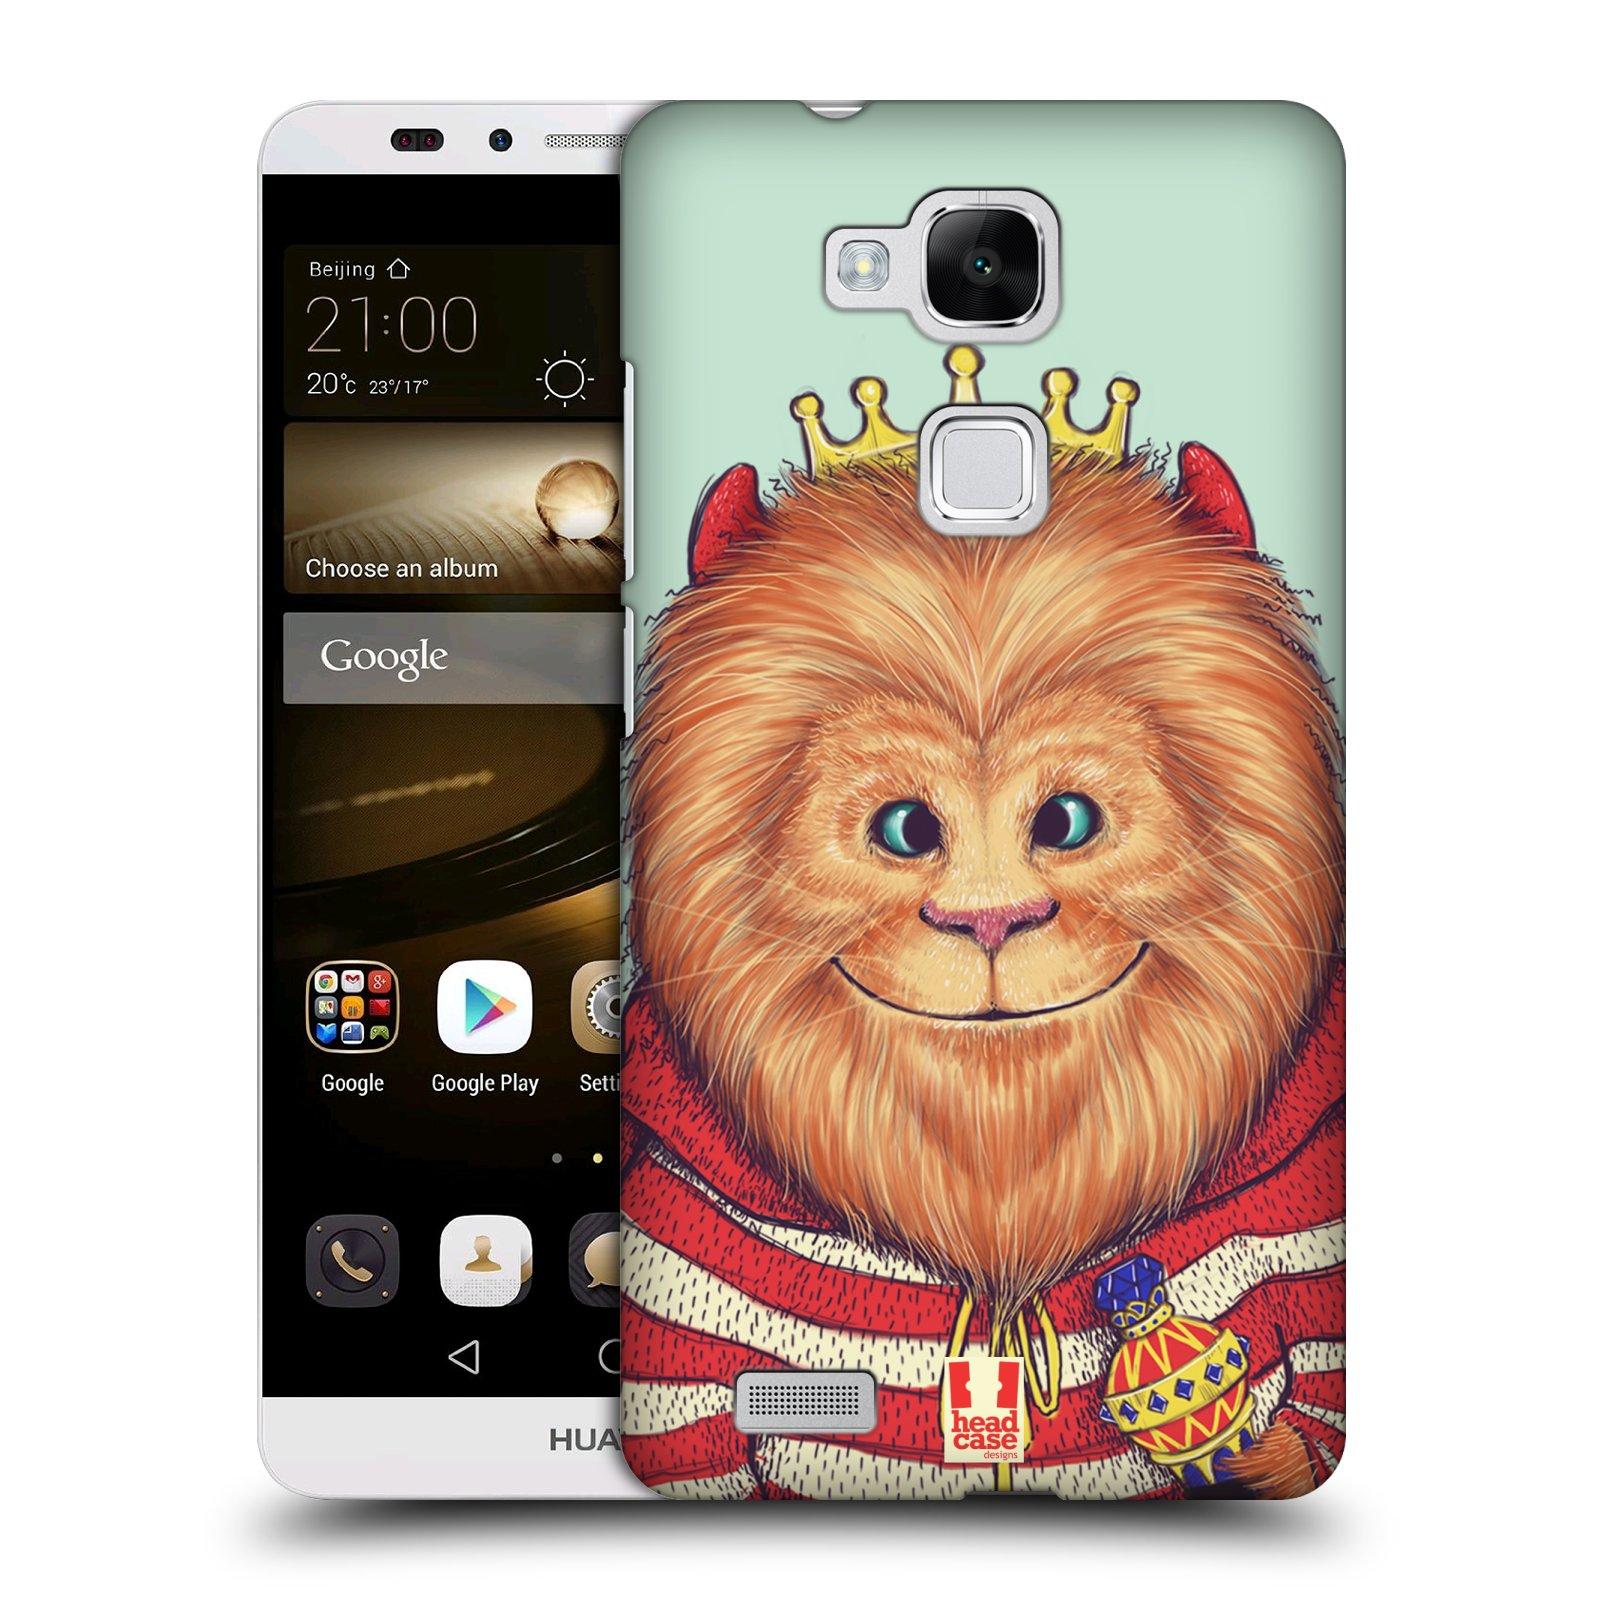 HEAD CASE plastový obal na mobil Huawei Mate 7 vzor Kreslená zvířátka lev